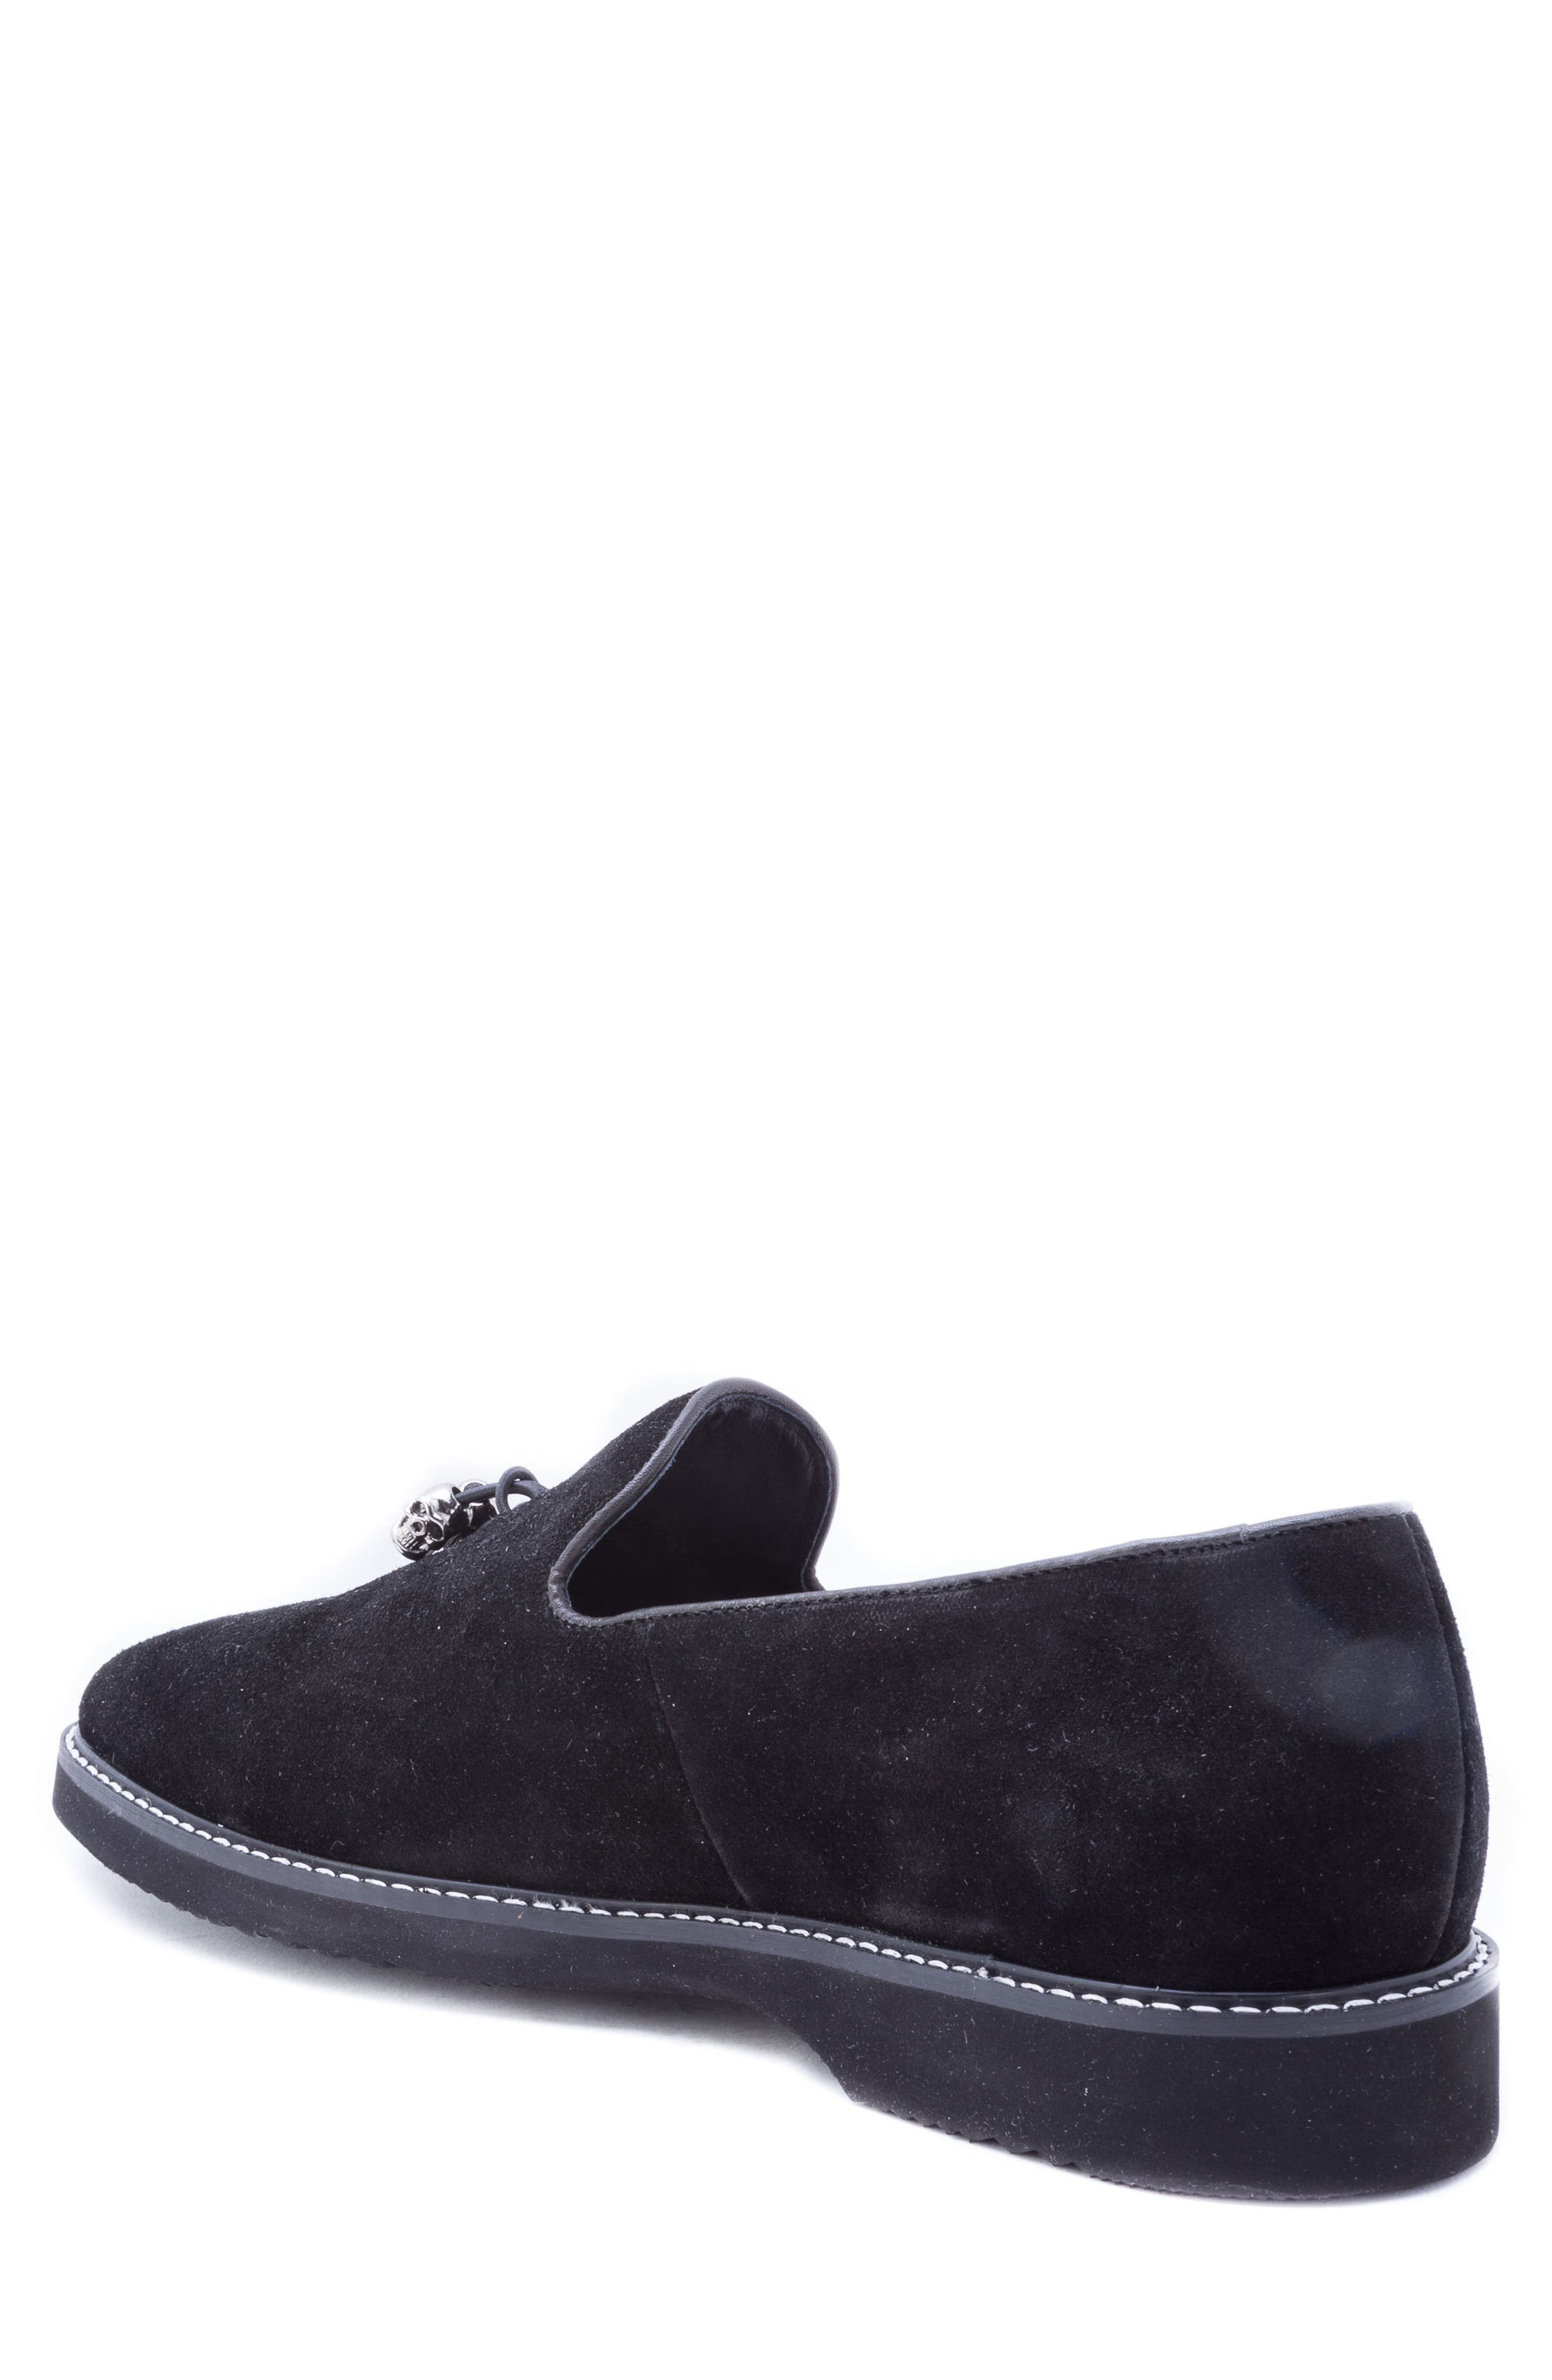 Badgley Mischka Heston Tassel Loafer,                             Alternate thumbnail 2, color,                             BLACK SUEDE